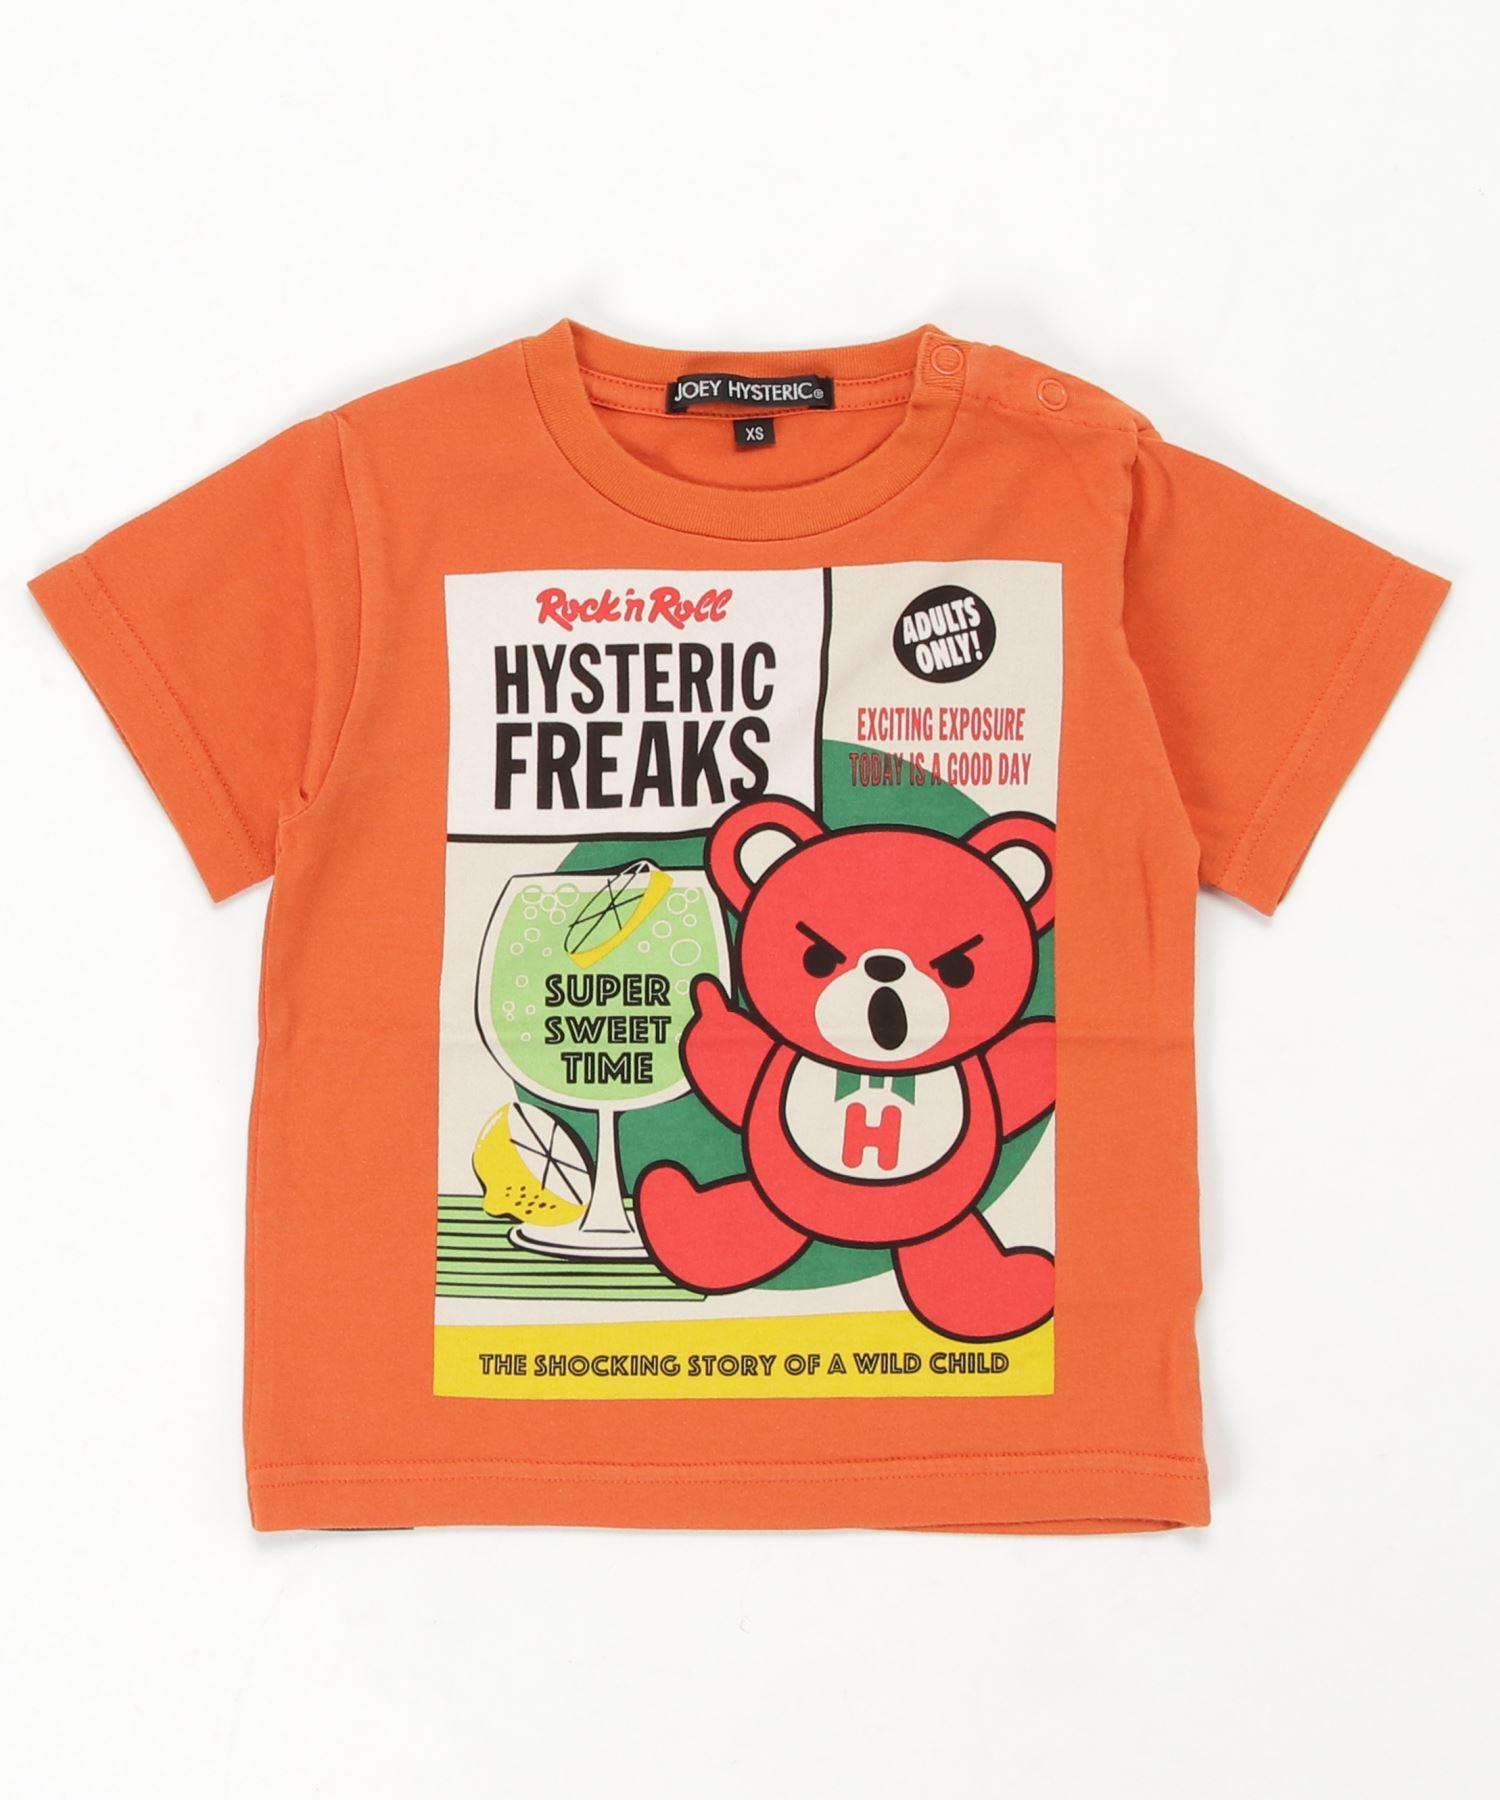 HYSTERIC FREAKS pt Tシャツ【XS/S/M】